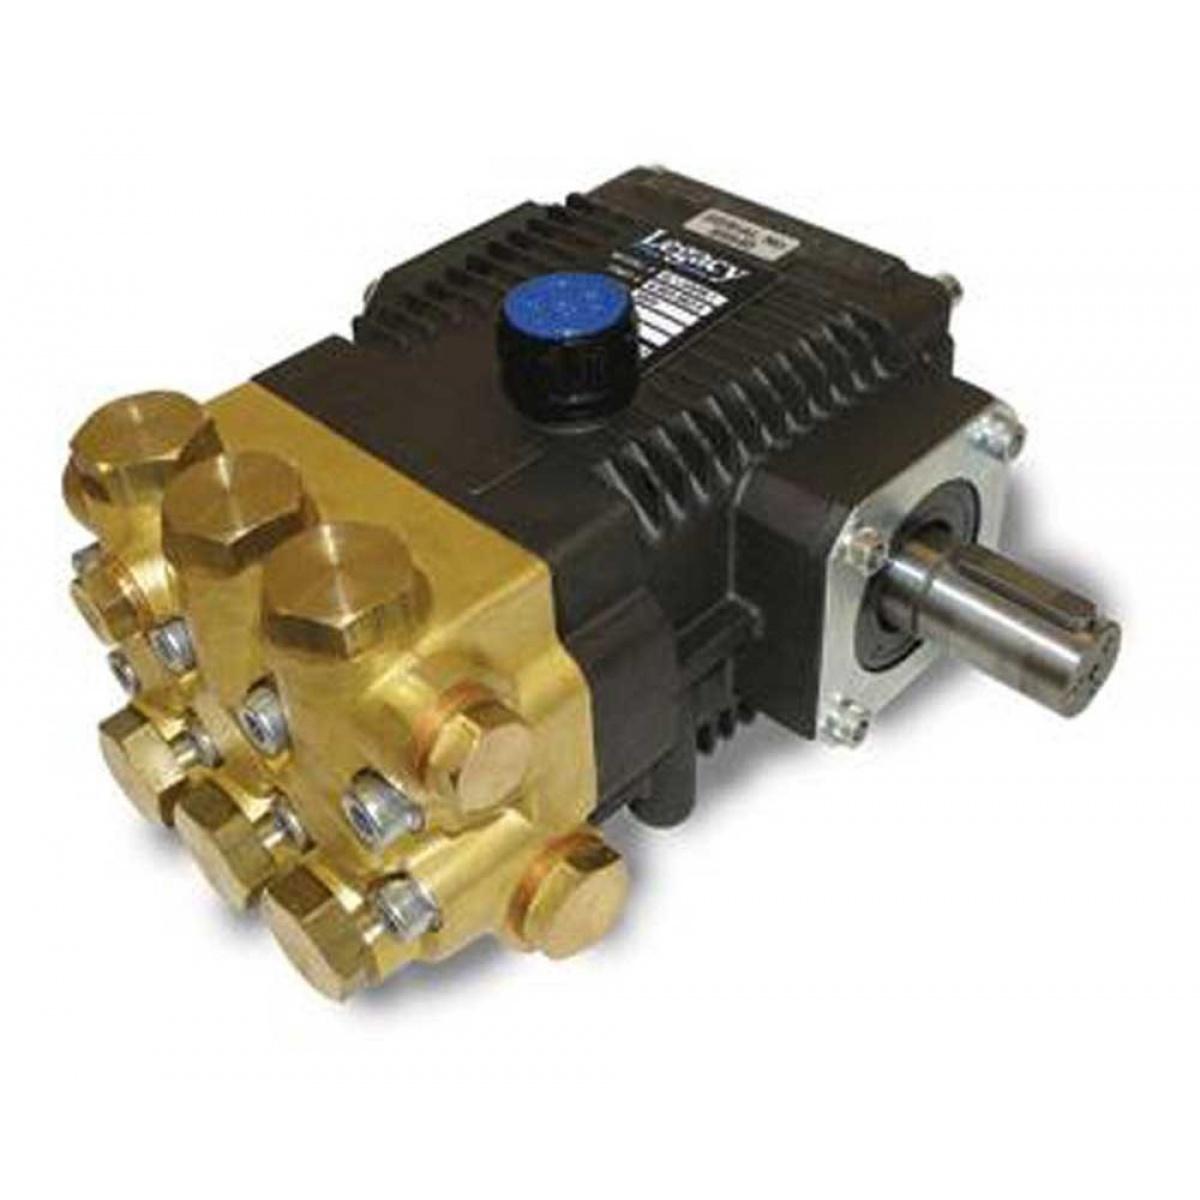 Pump, Legacy Gb4025r, 4.0@2500, 1550 Rpm